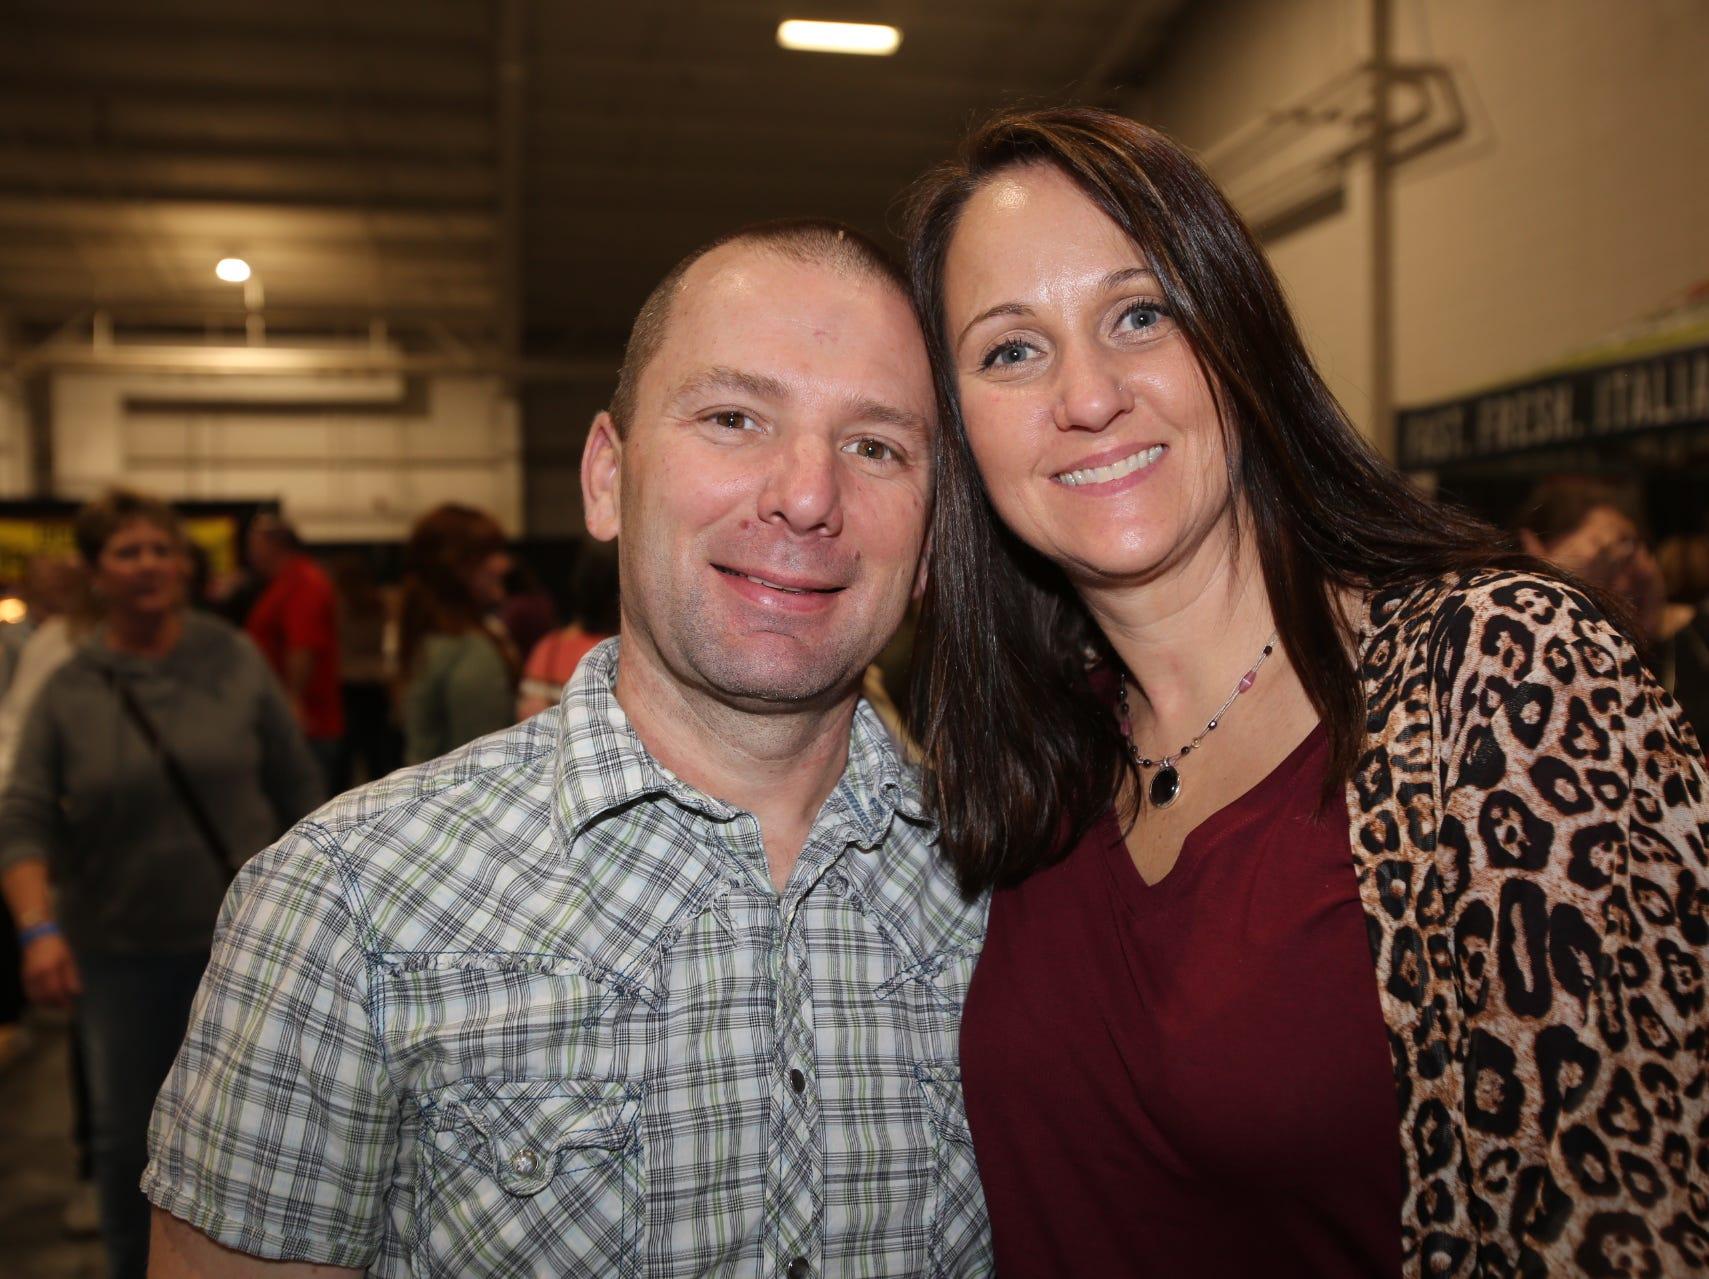 Dean and Christi Ulrich